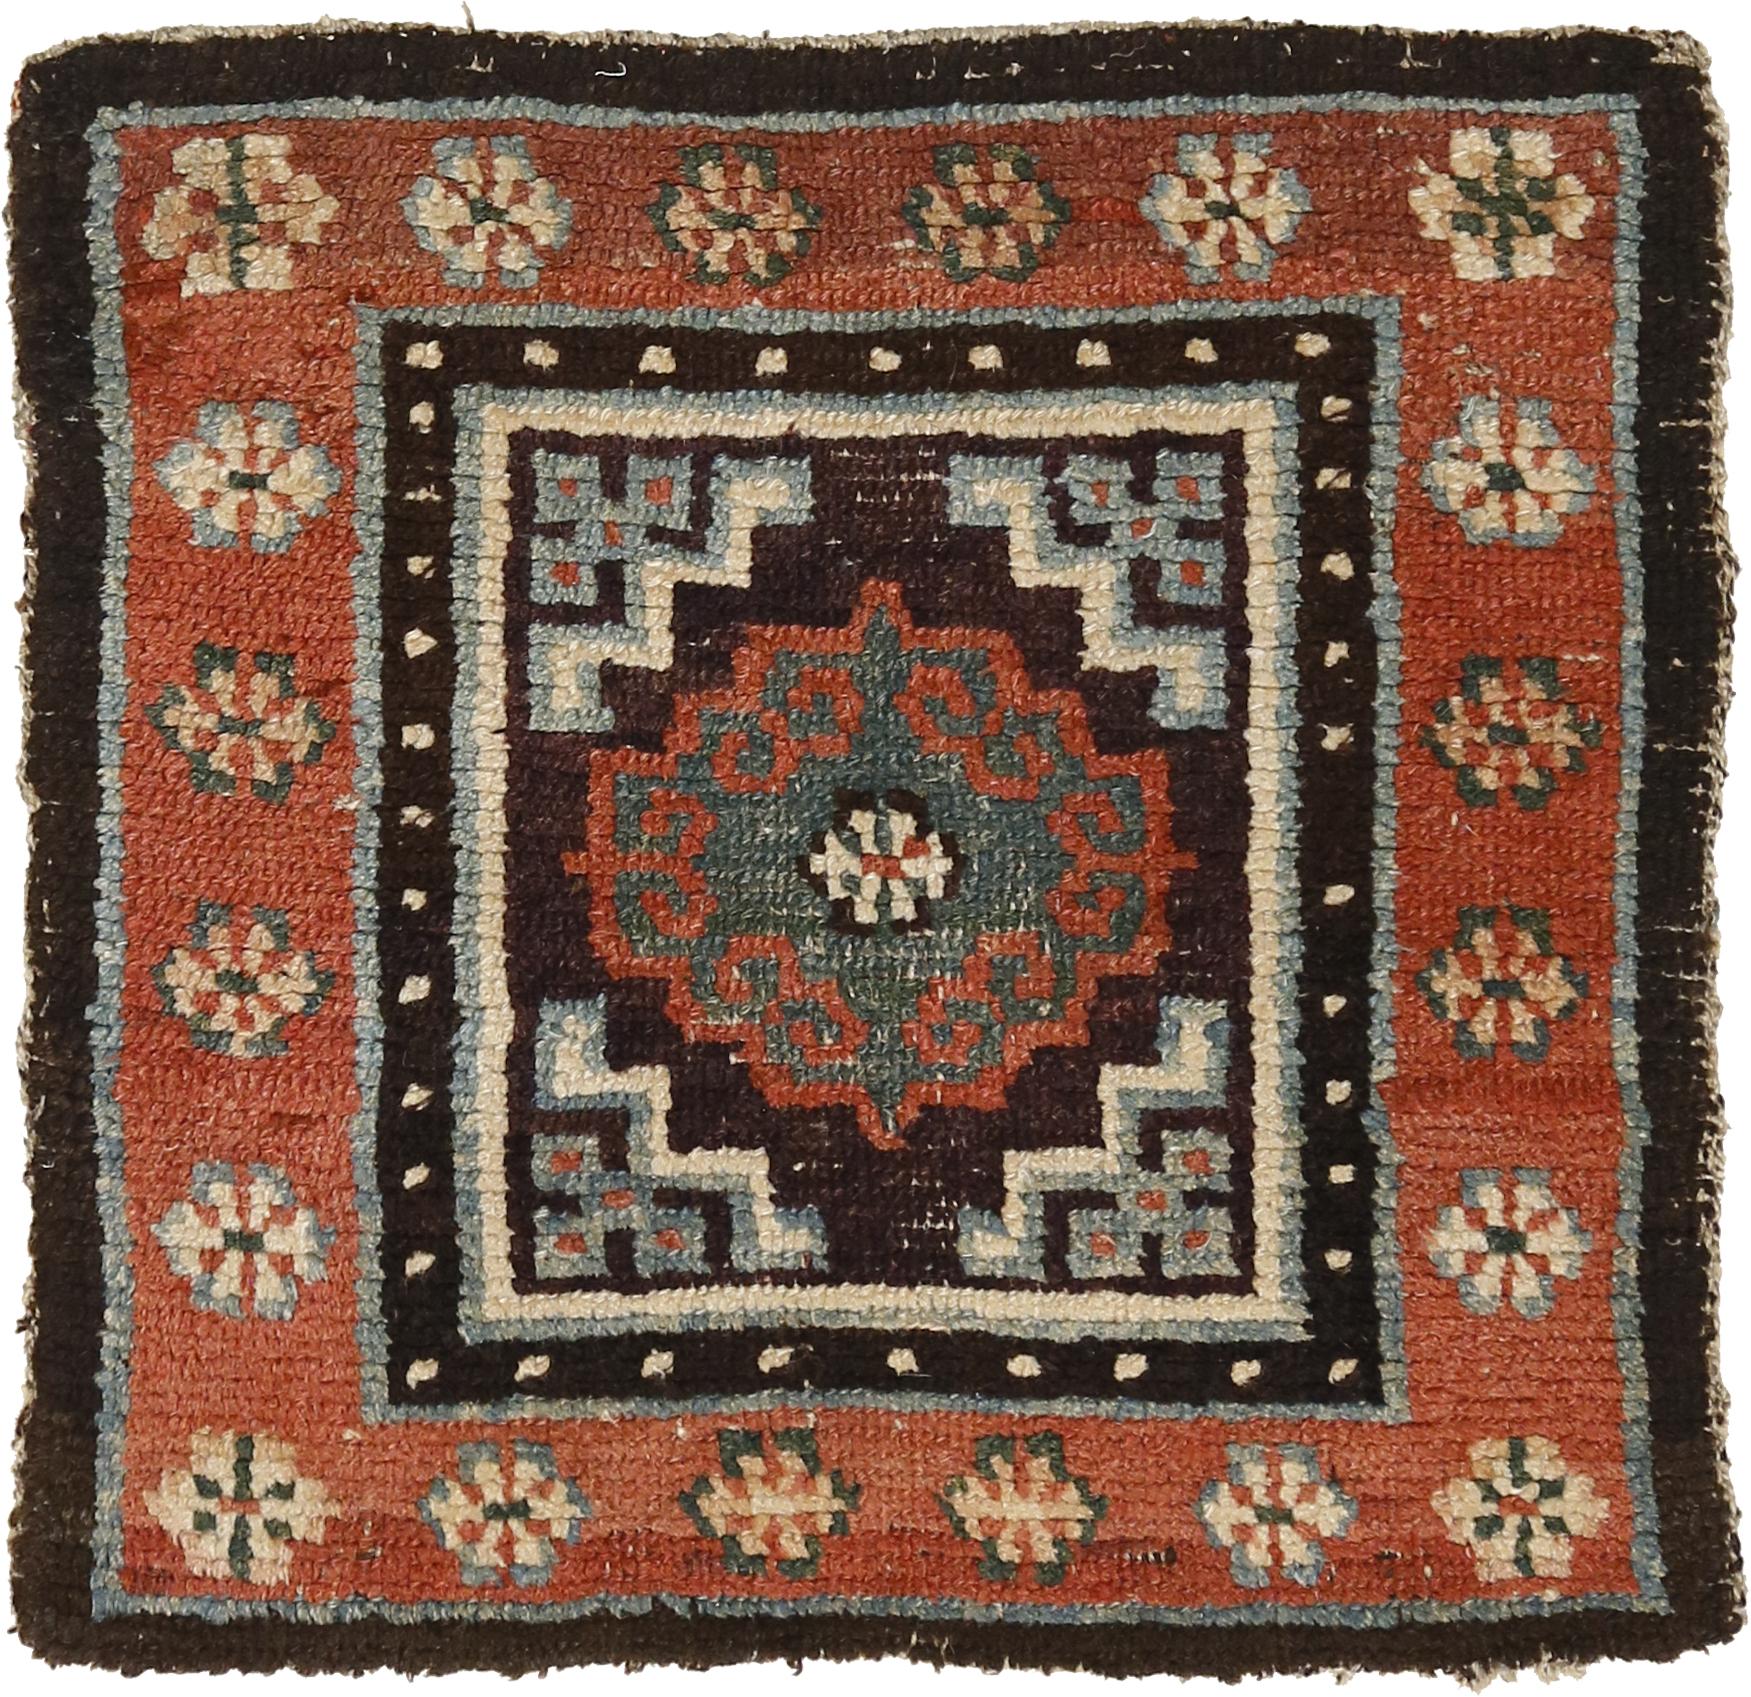 Meditation mat with archaic mandala